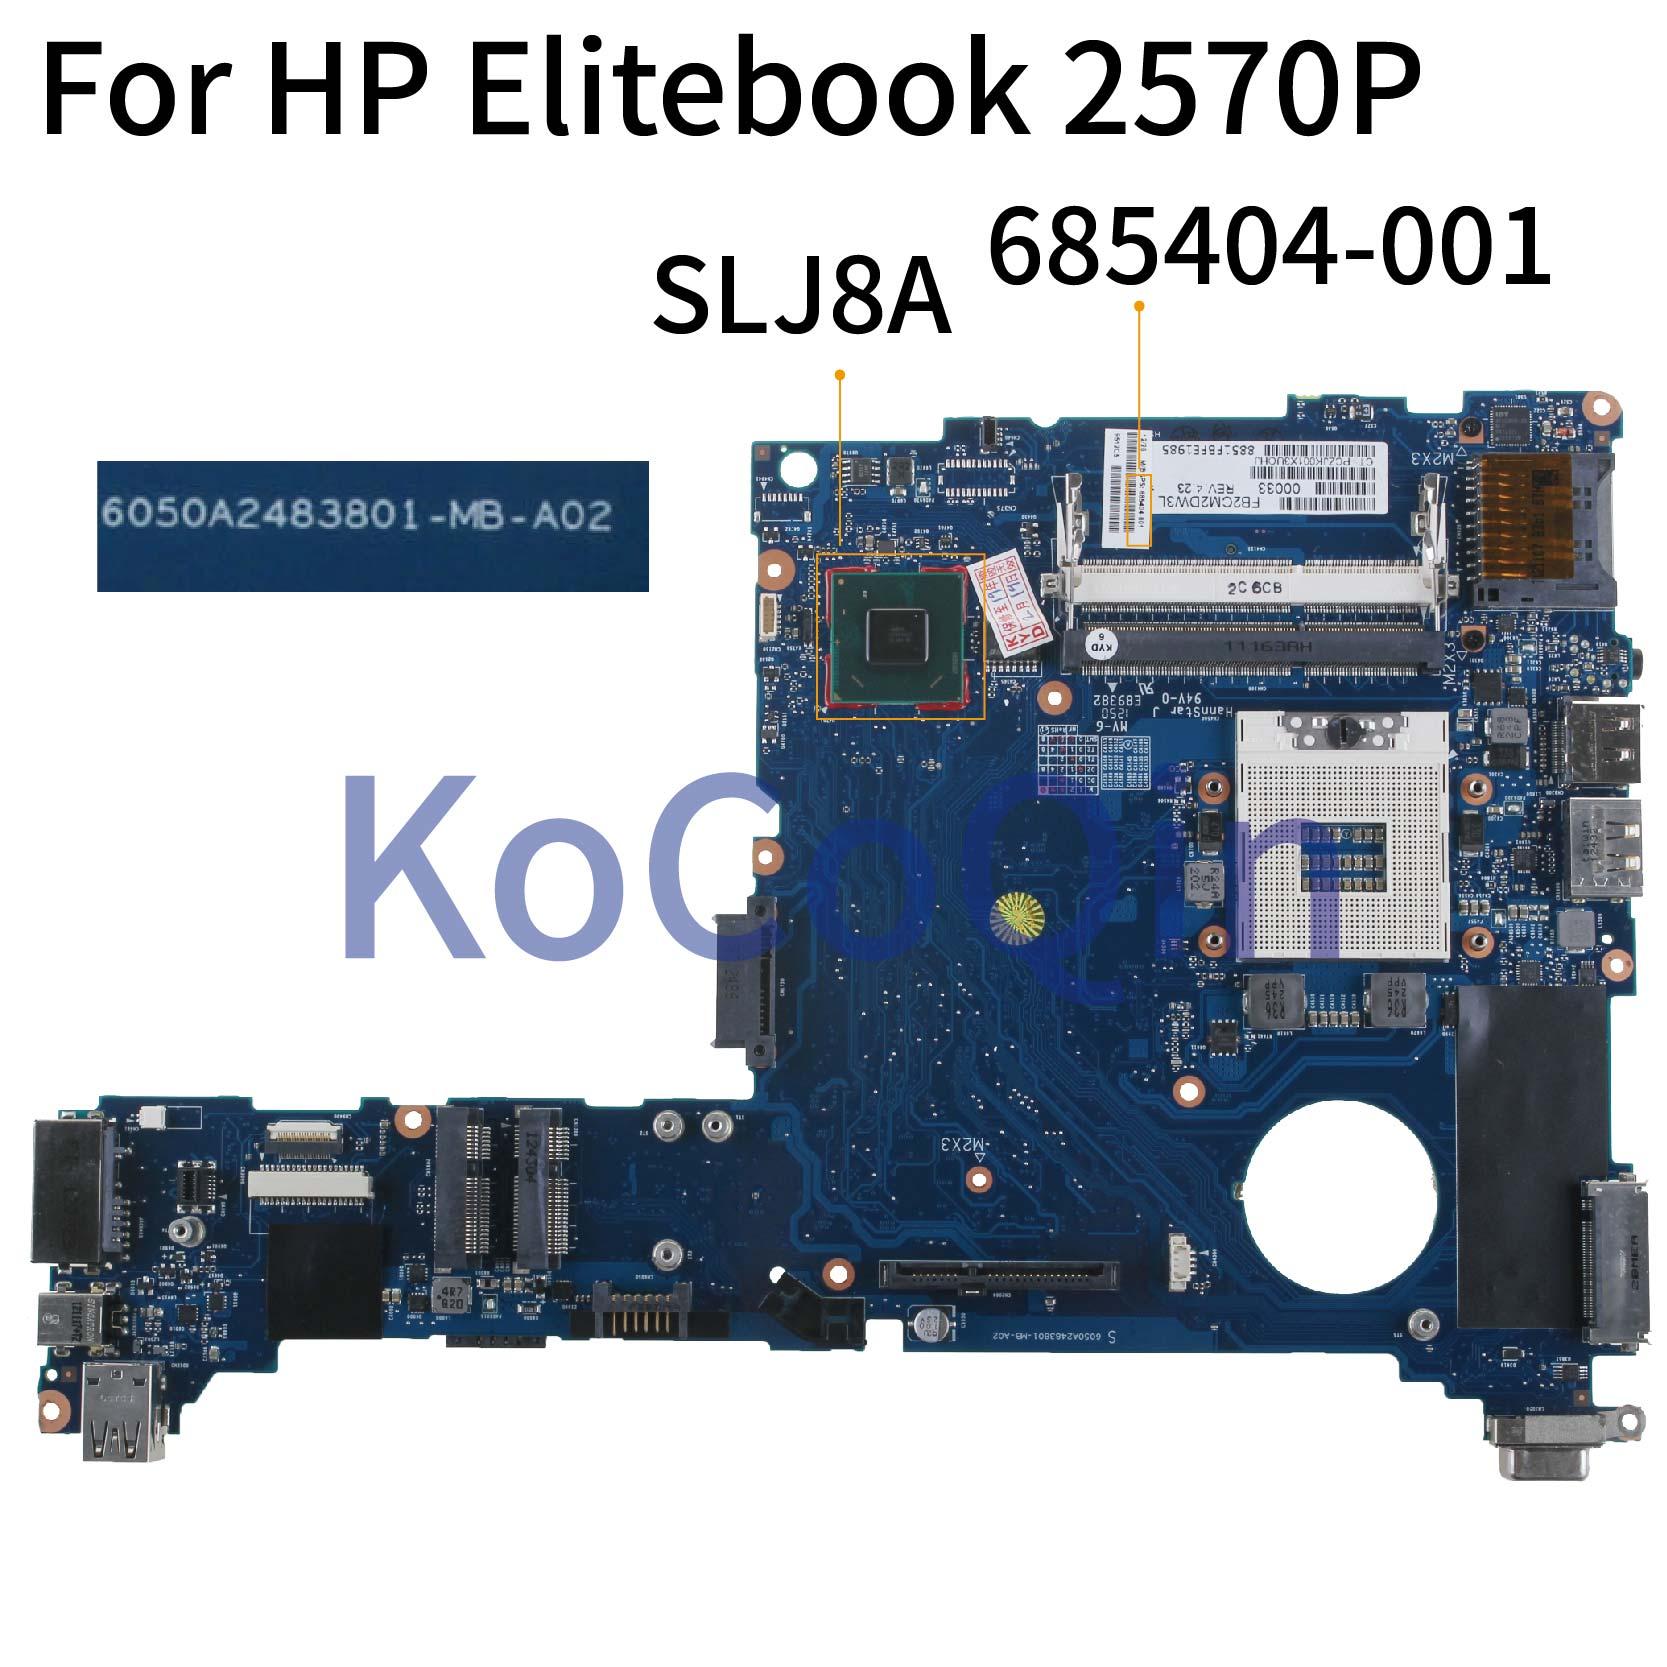 Placa base para ordenador portátil KoCoQin para HP Elitebook 2570P, placa base 685404-001 685404-501 6050A2483801-MA-A02 SLJ8A